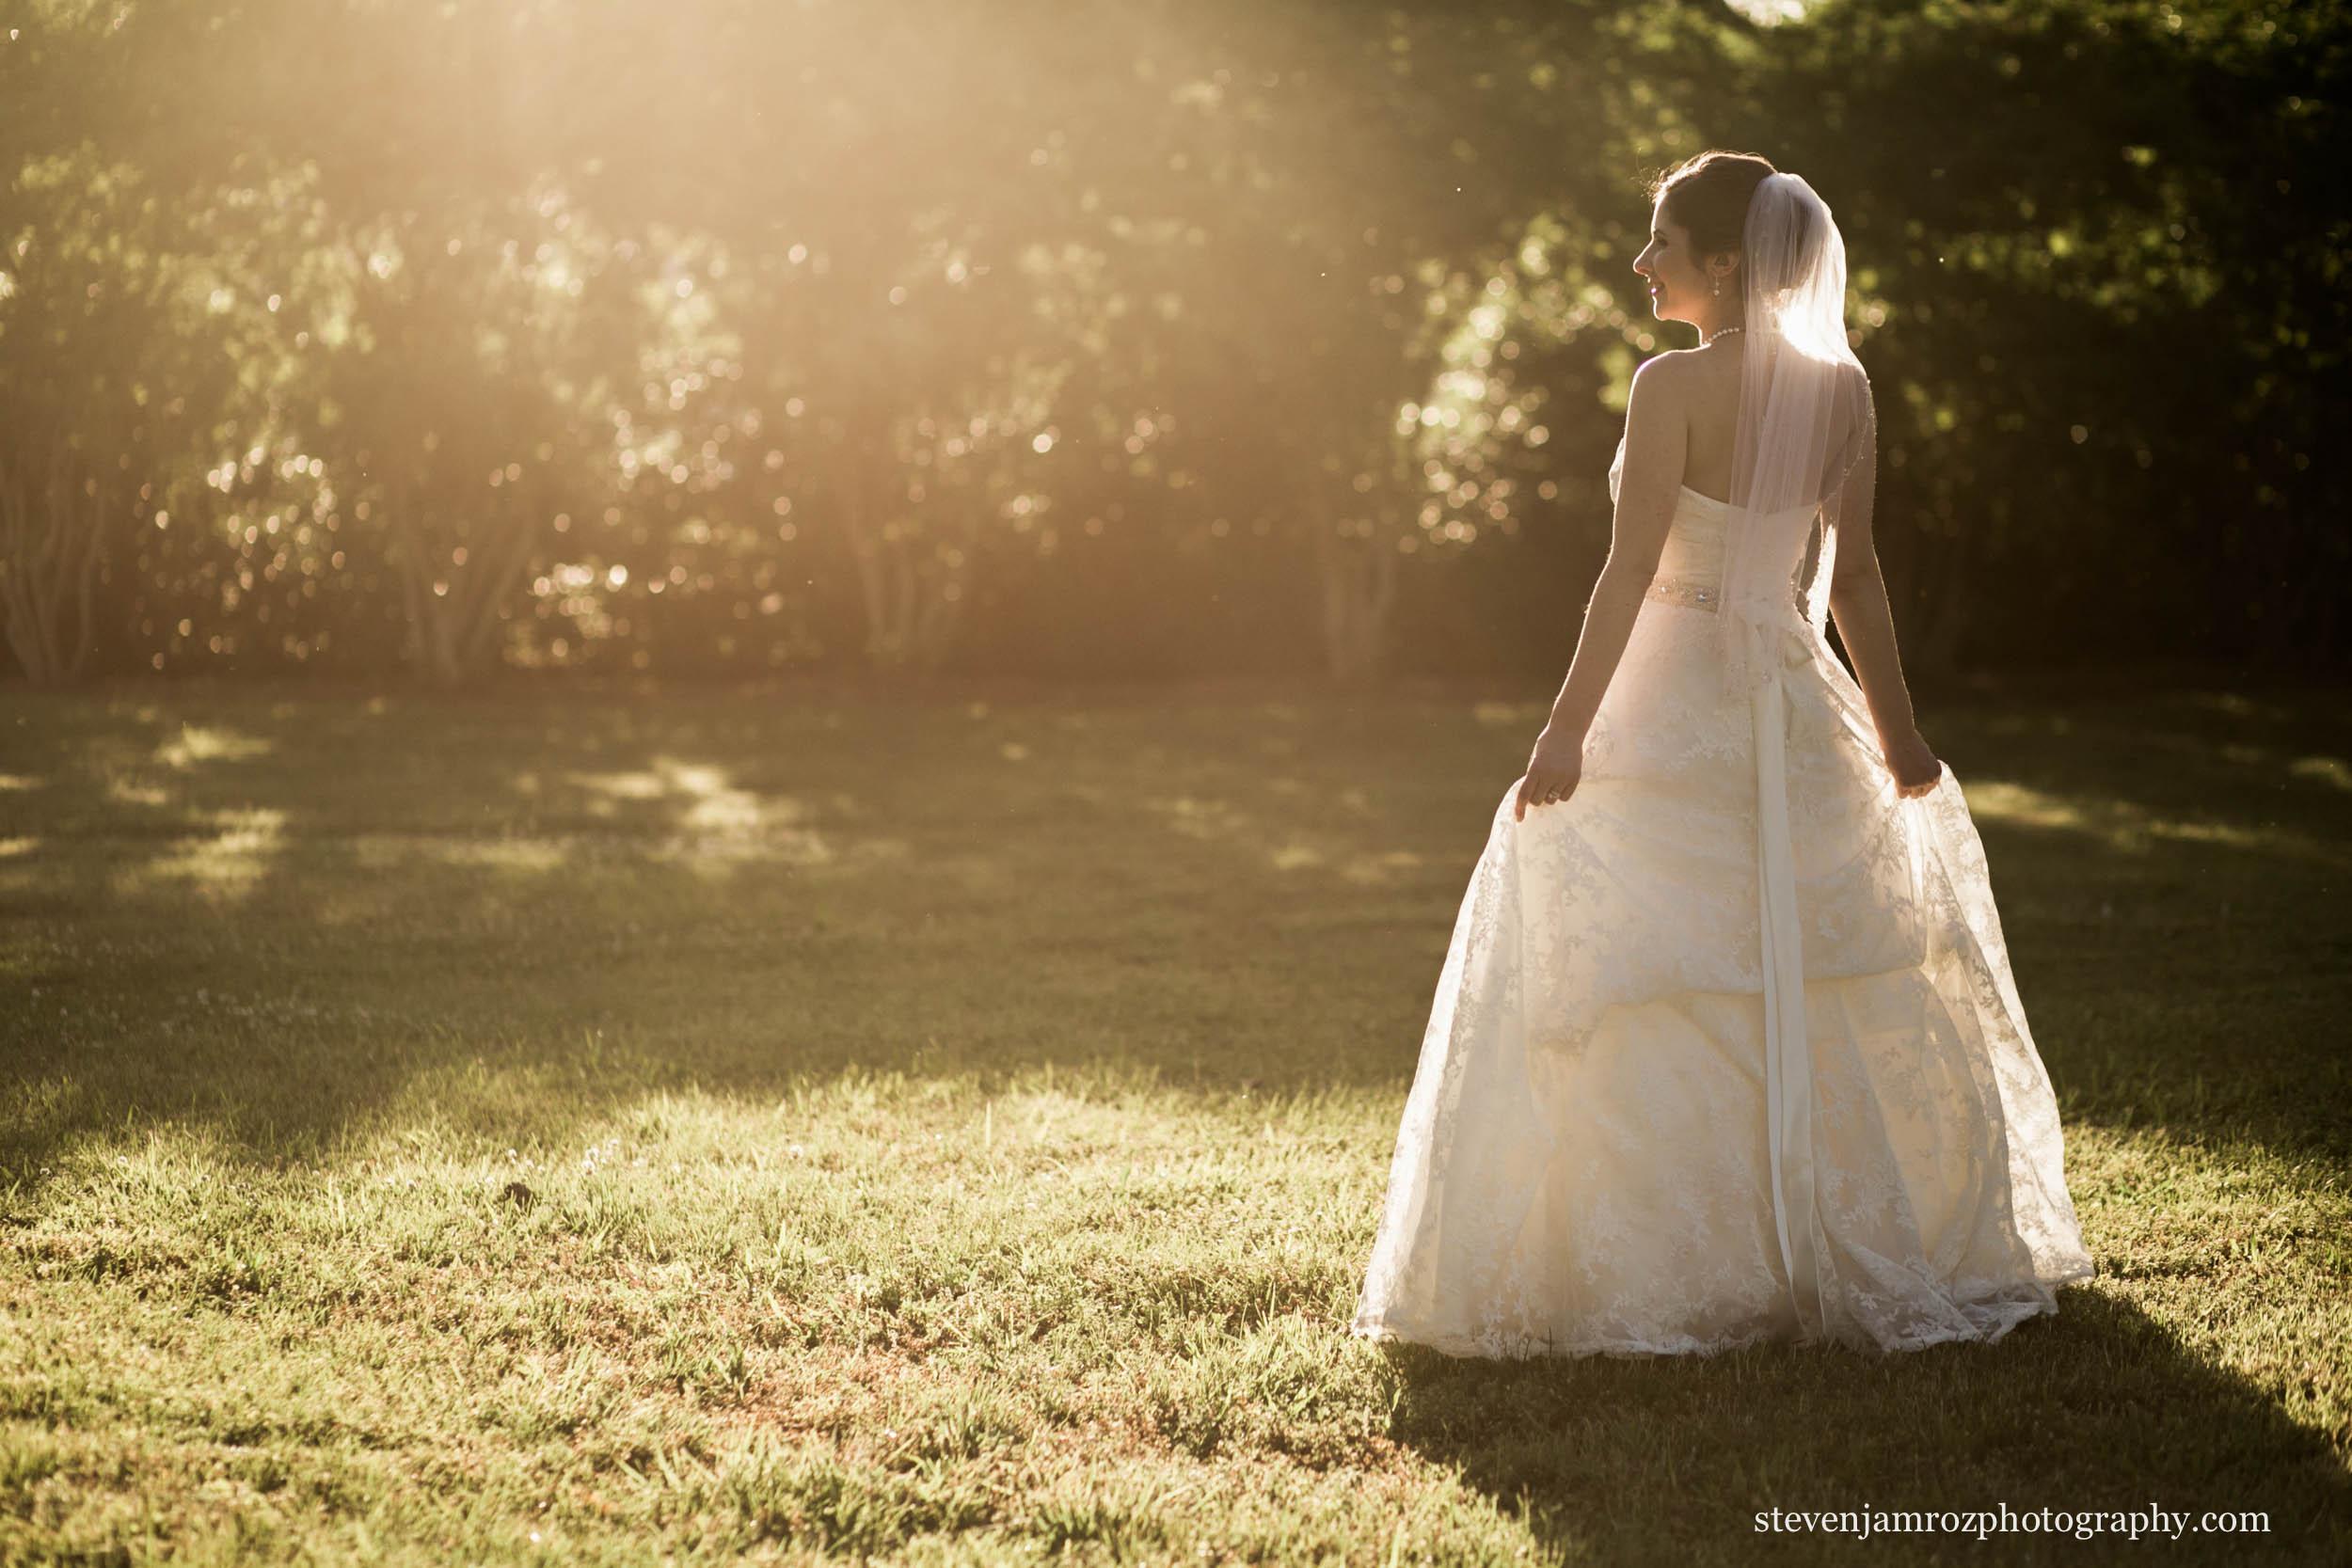 backlit-wedding-portrait-steven-jamroz-photography-0544.jpg